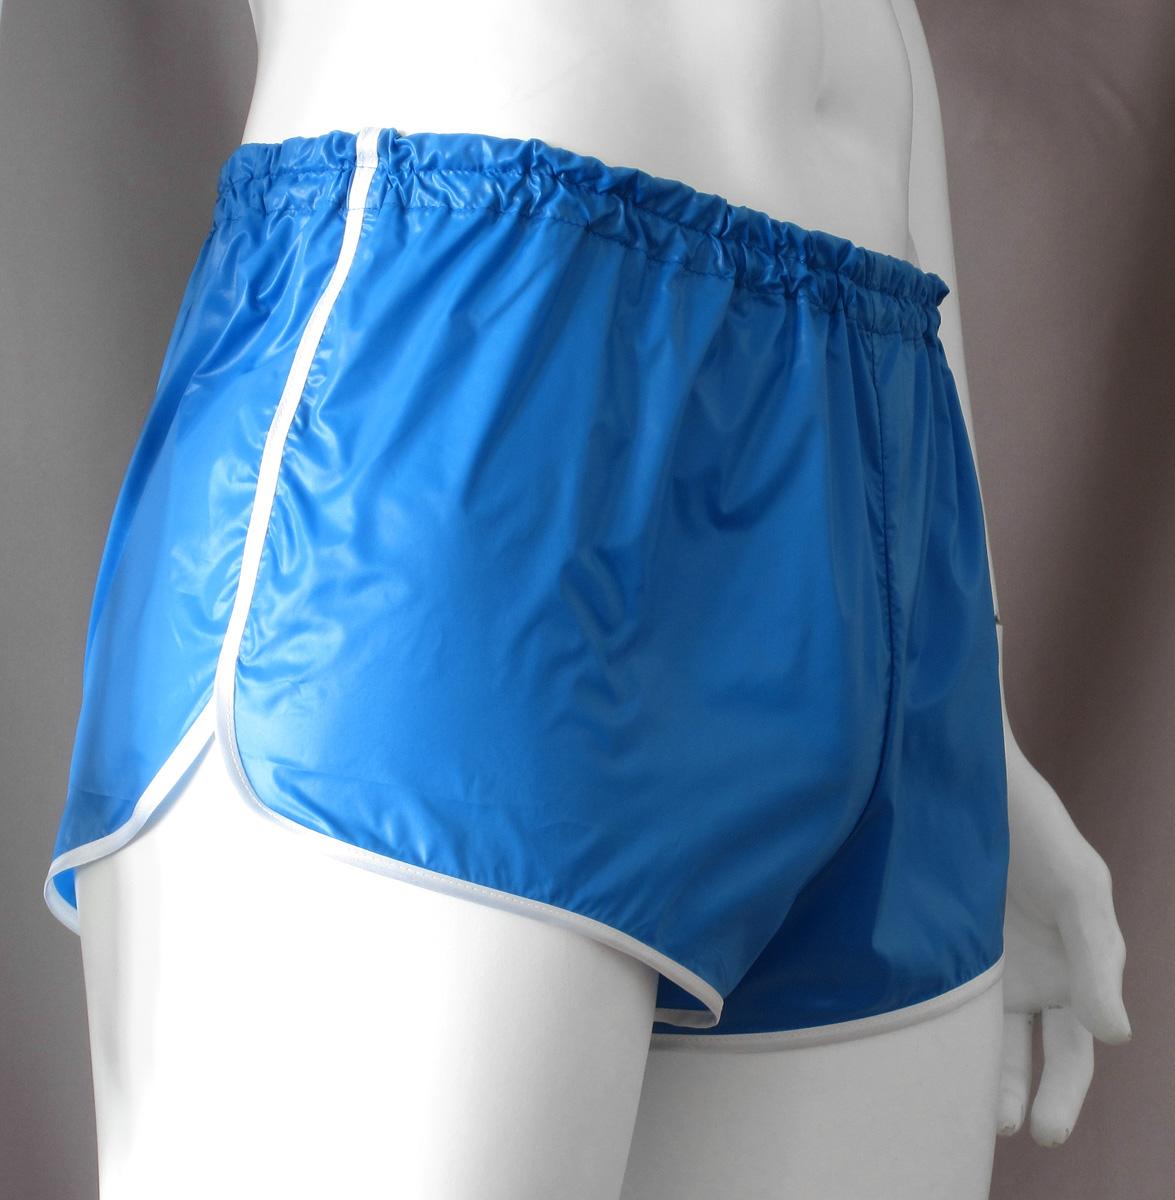 Retro Sprinter Shorts Of Shiny Nylon For Men Lime Black Pictures to